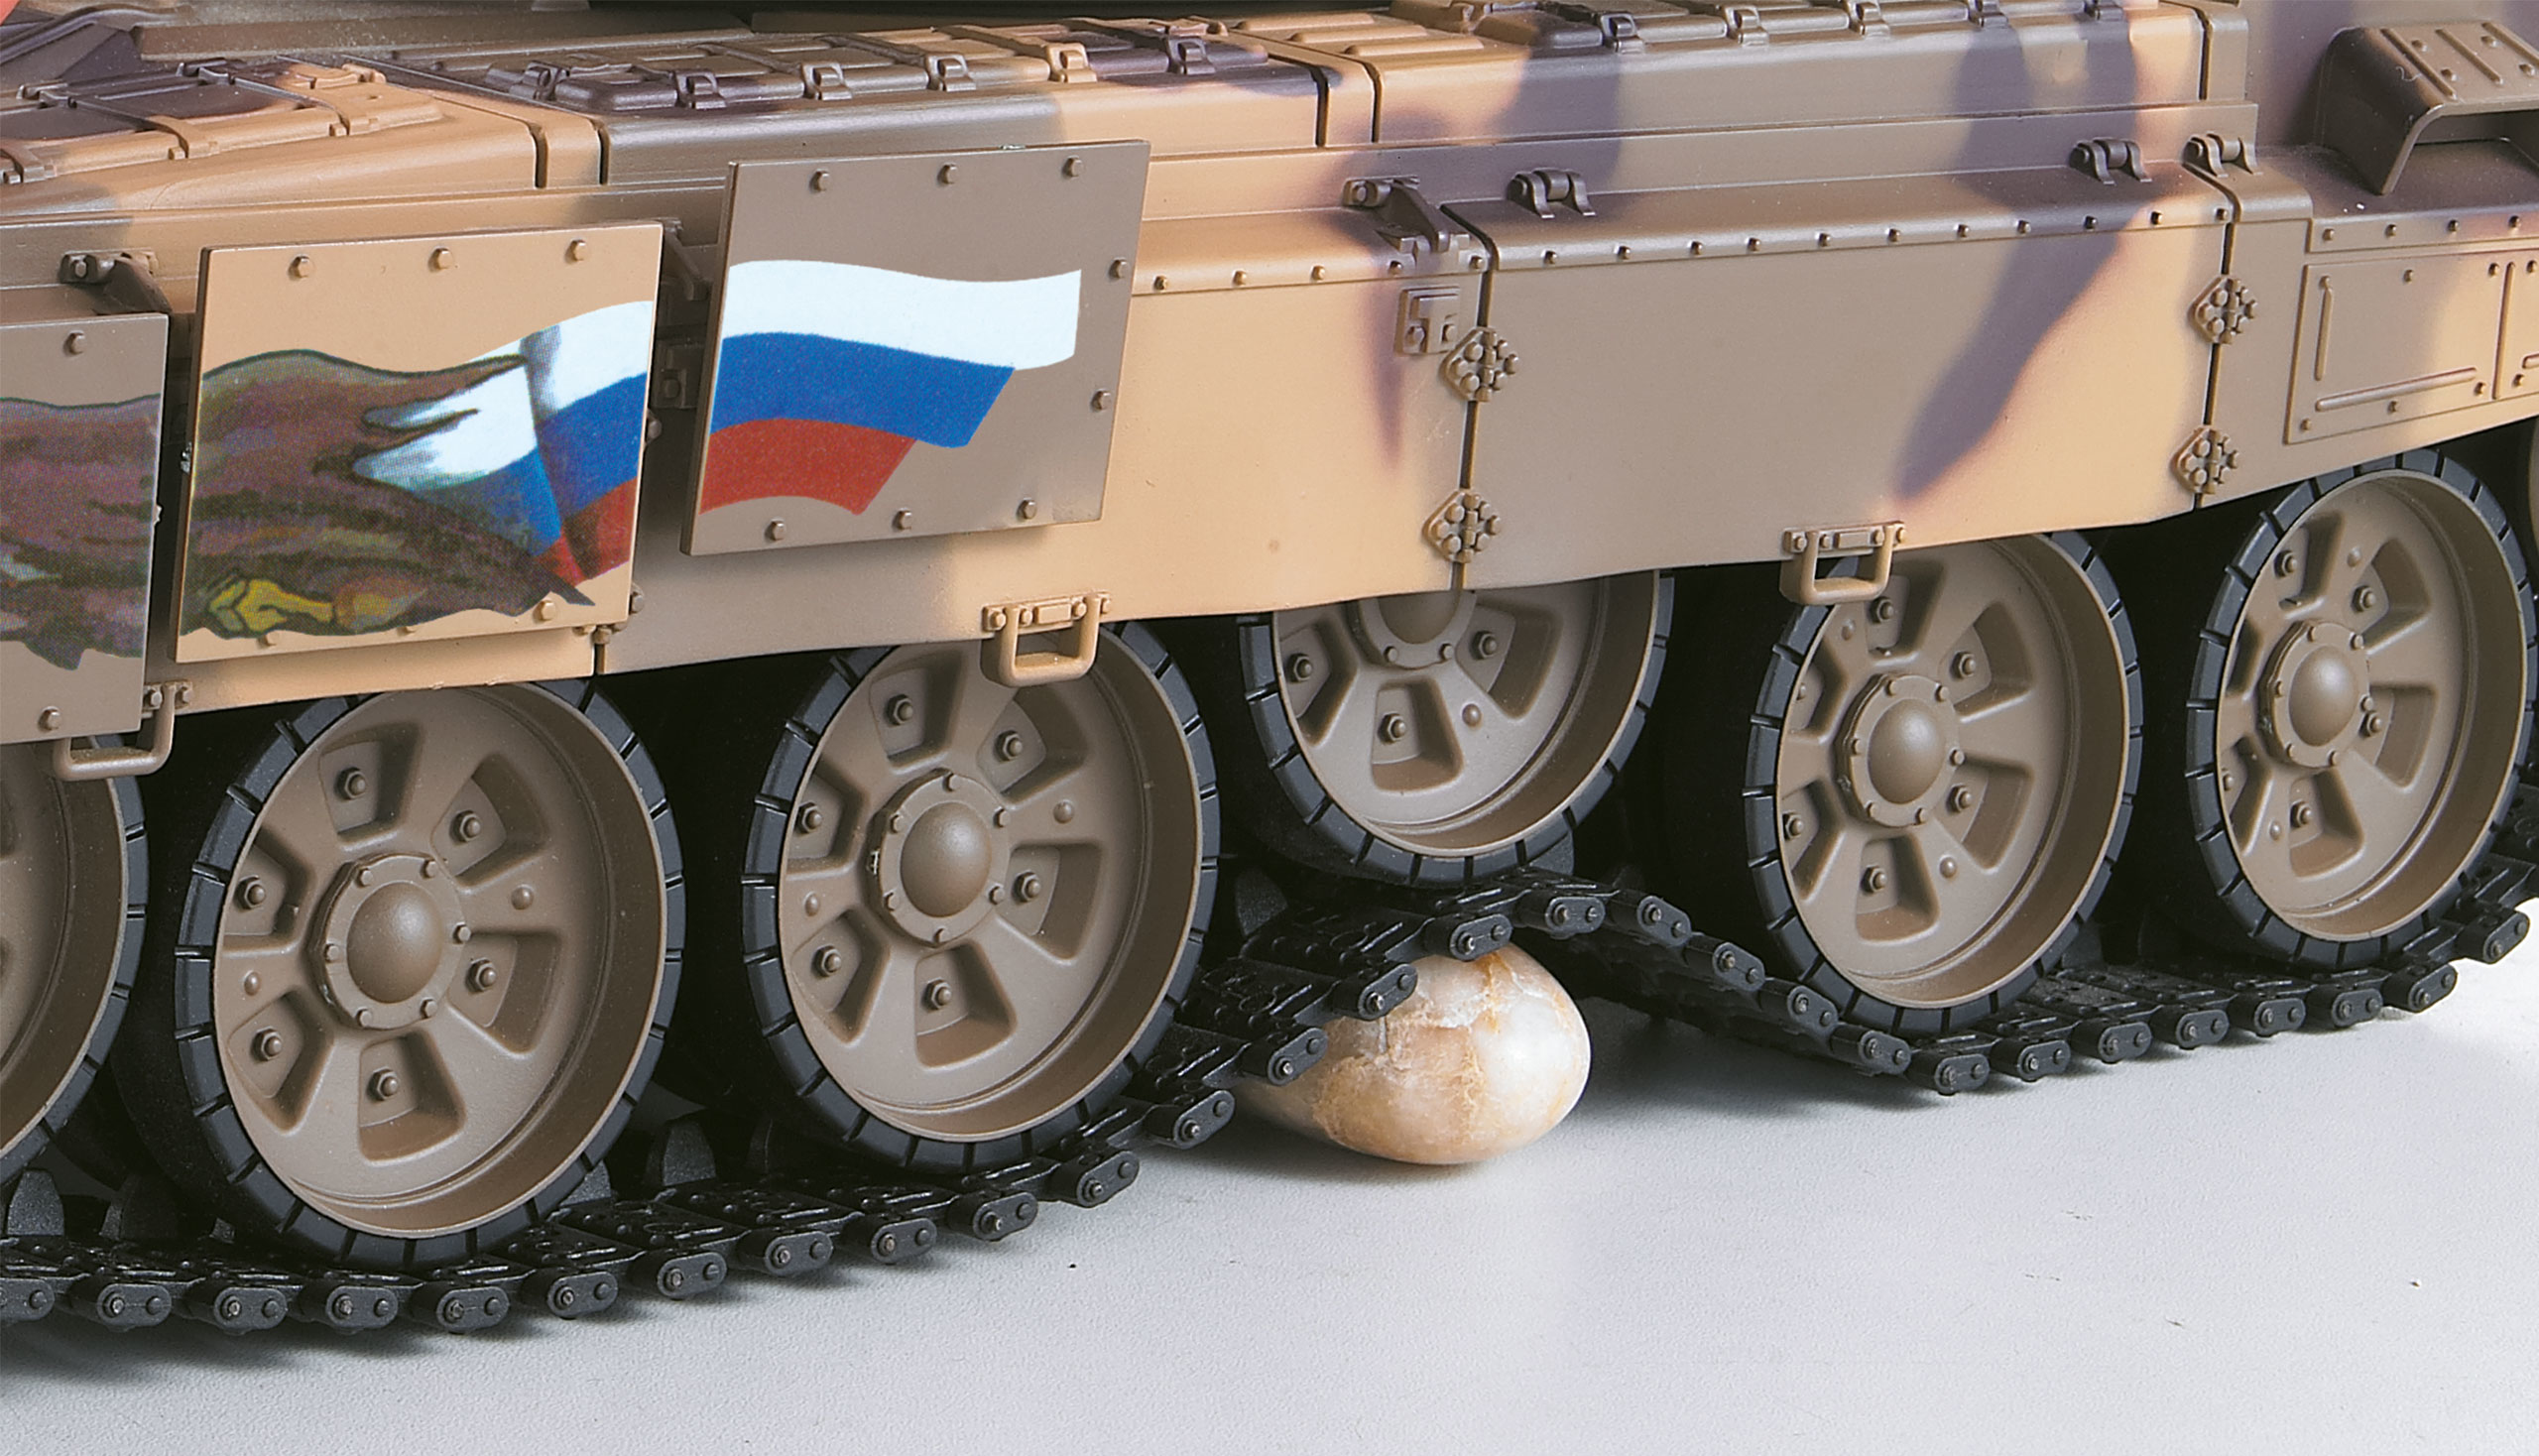 Amewi T-90 - Funkgesteuerter (RC) Panzer - Elektromotor - 1:16 - Betriebsbereit (RTR) - Junge - 14 Jahr(e)